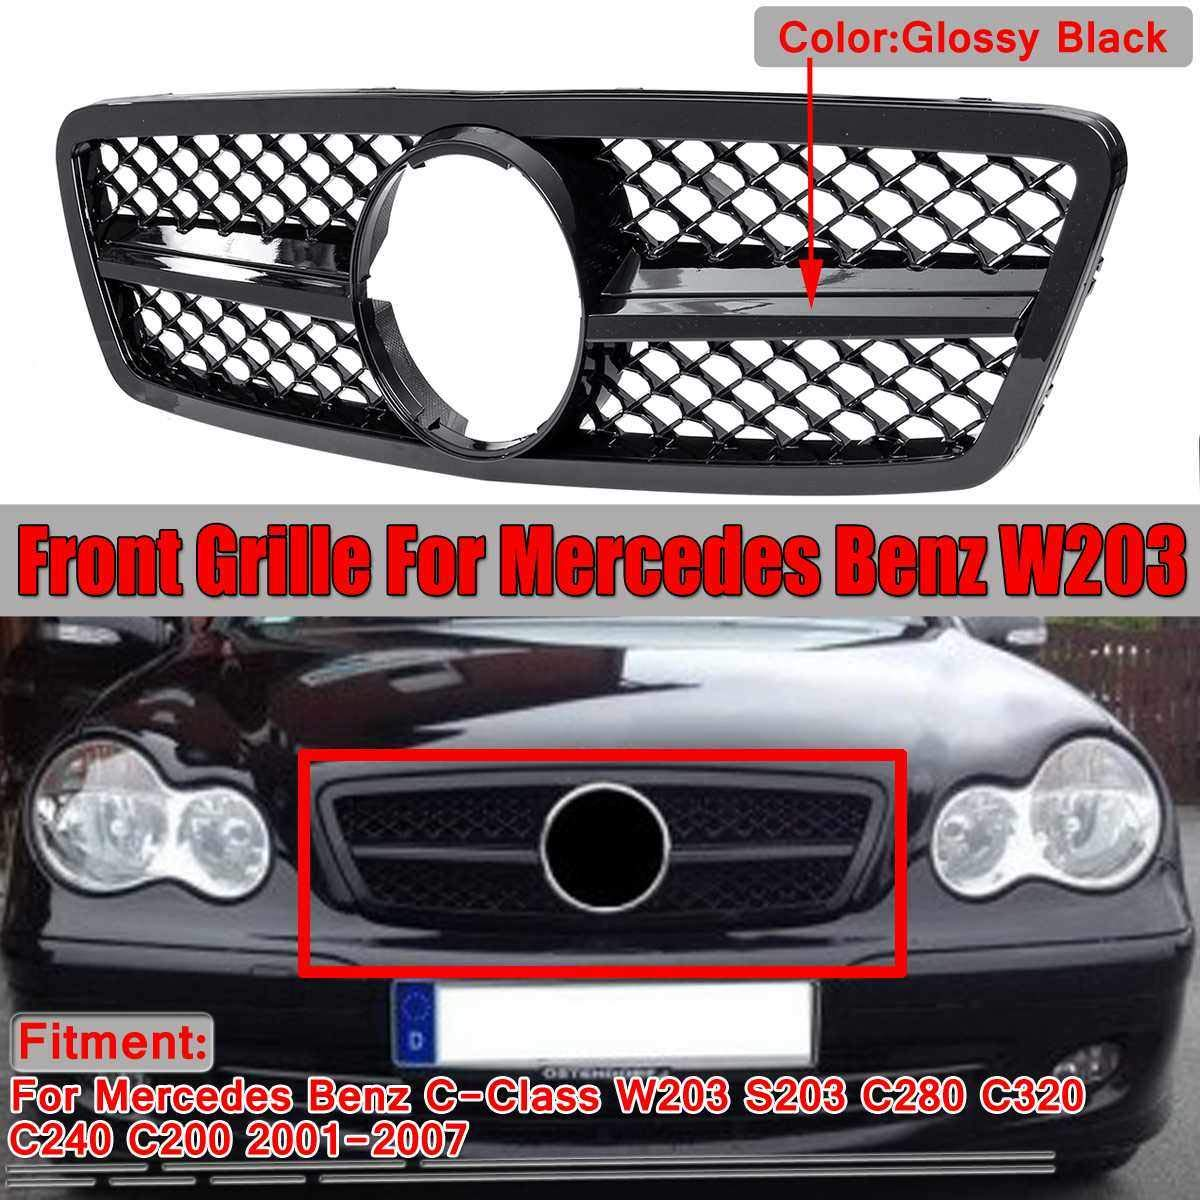 AniFM Parrilla Delantera del Coche AMG Style Grill para Mercedes Benz Clase C W203 S203 C280 C320 C240 C200 2001-2007